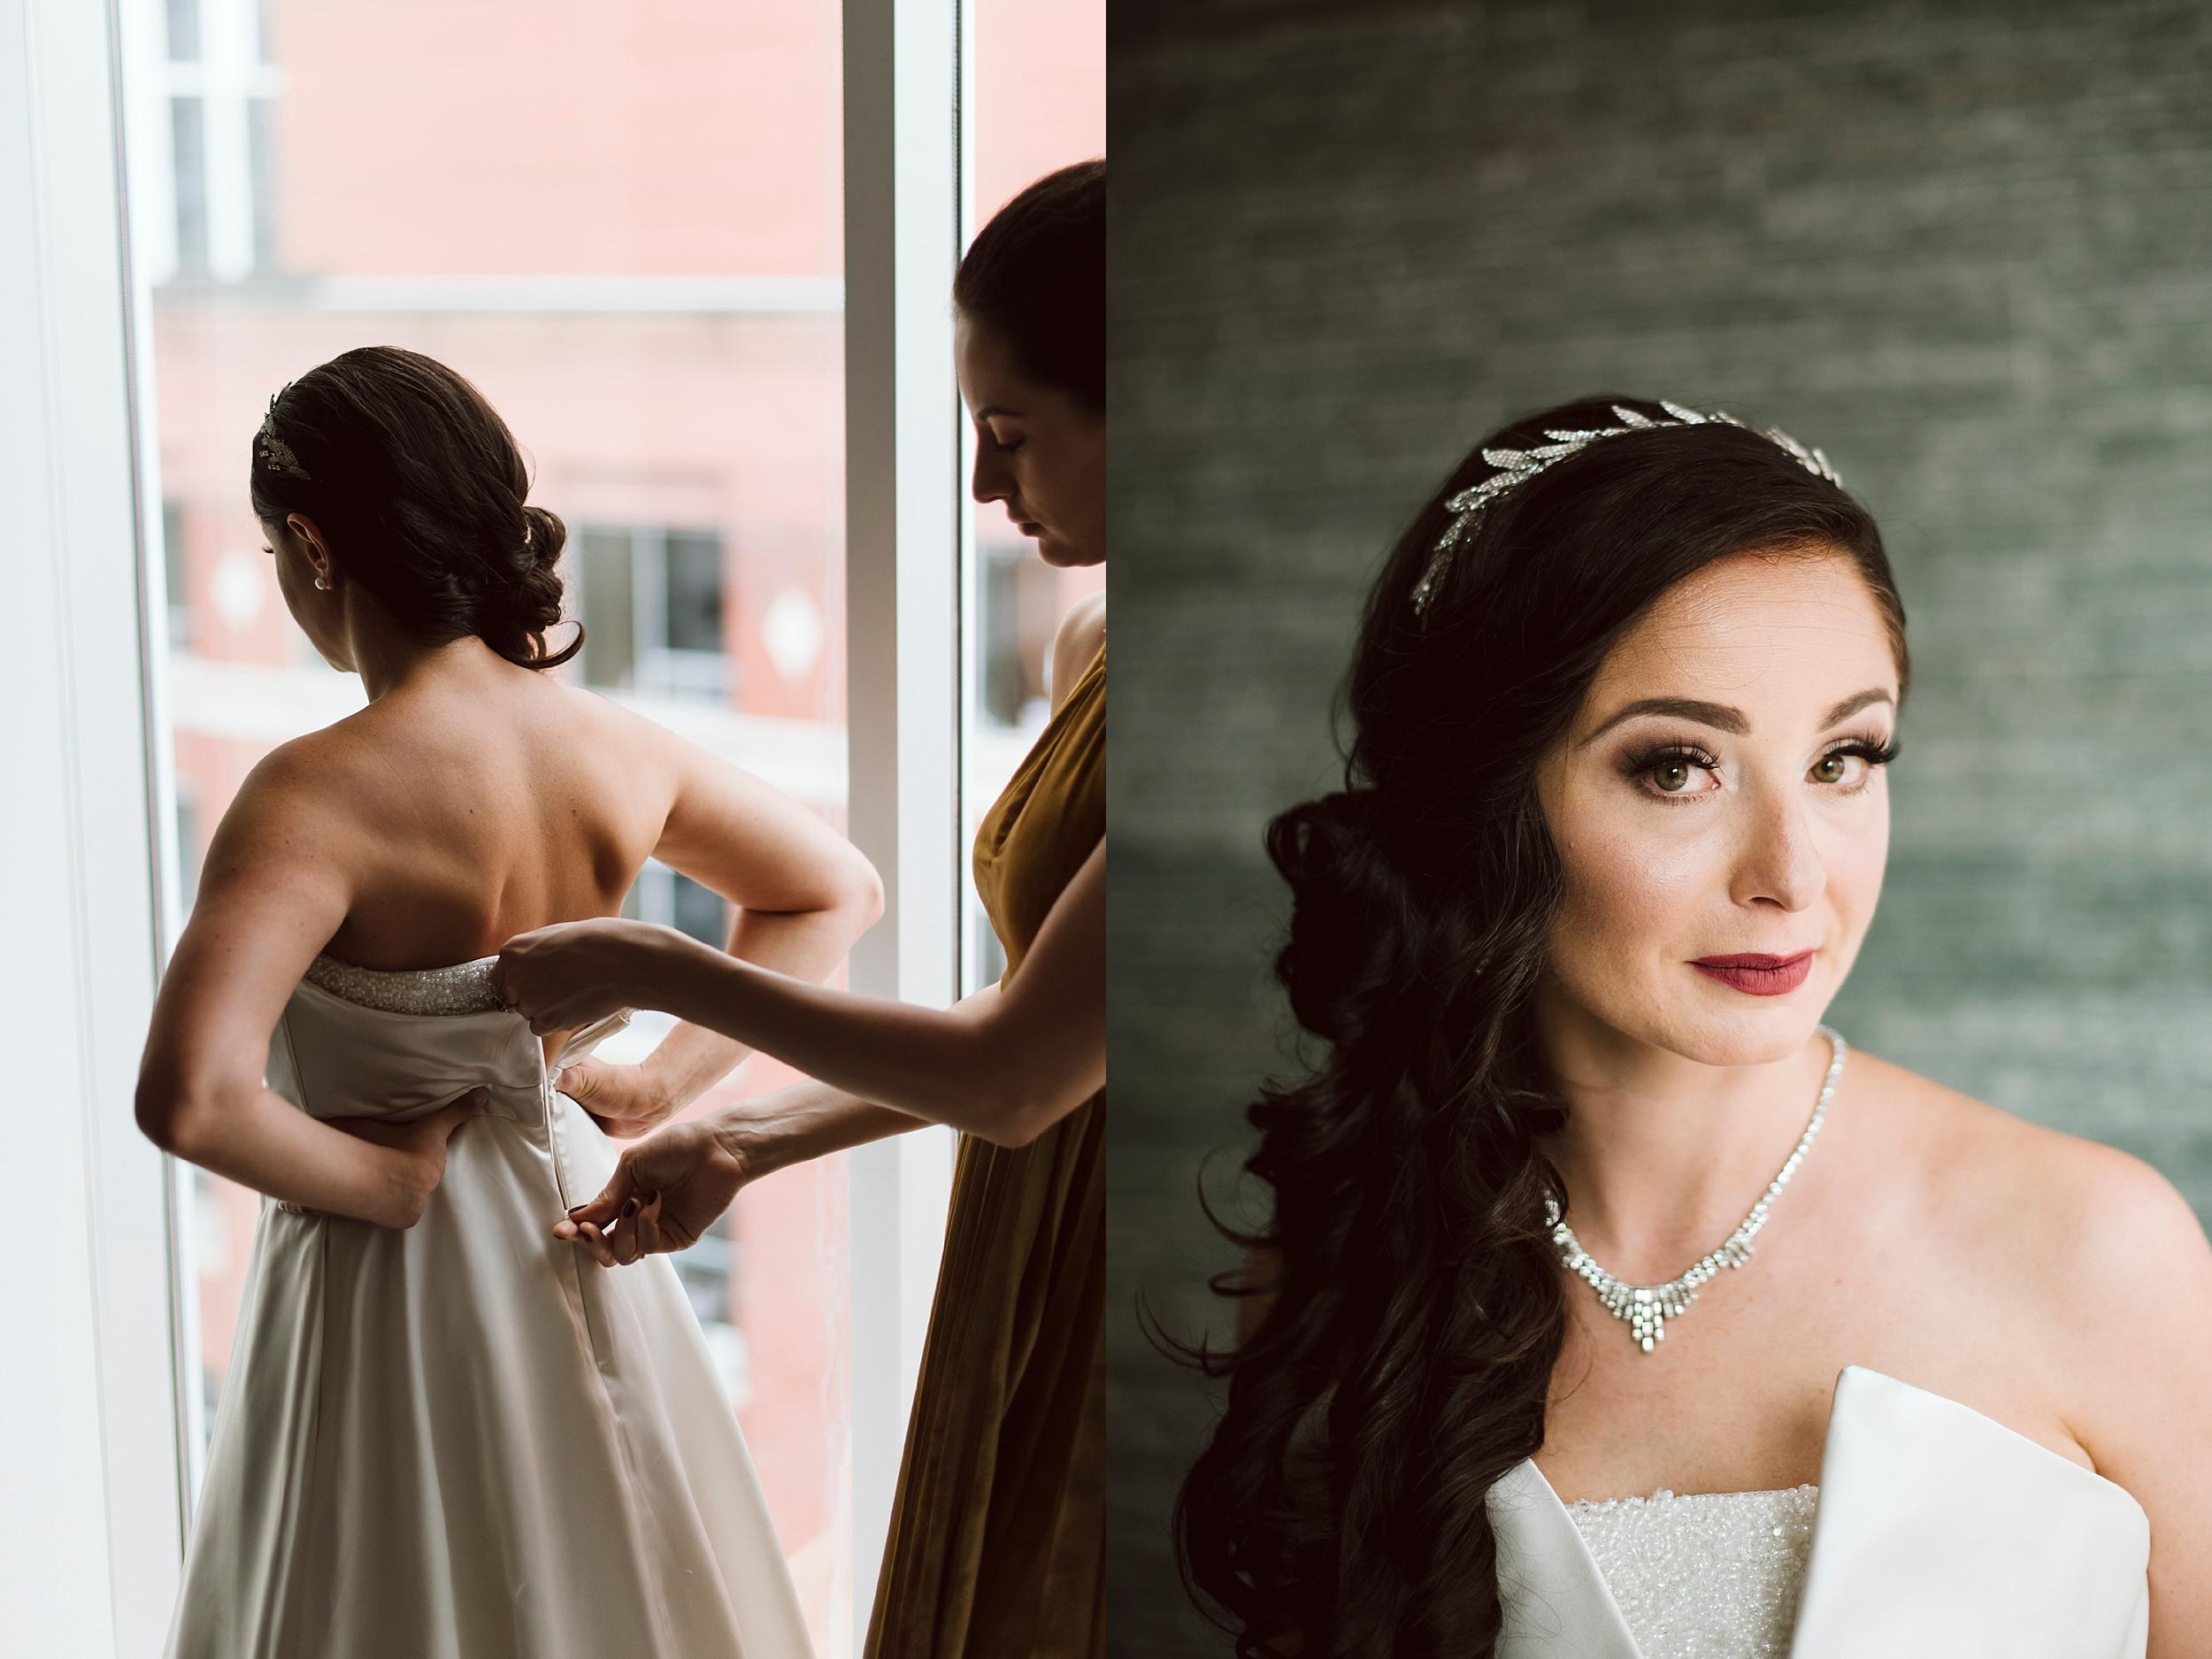 Sunnyside_Pavilion_Wedding_Toronto_Photographer_0008.jpg